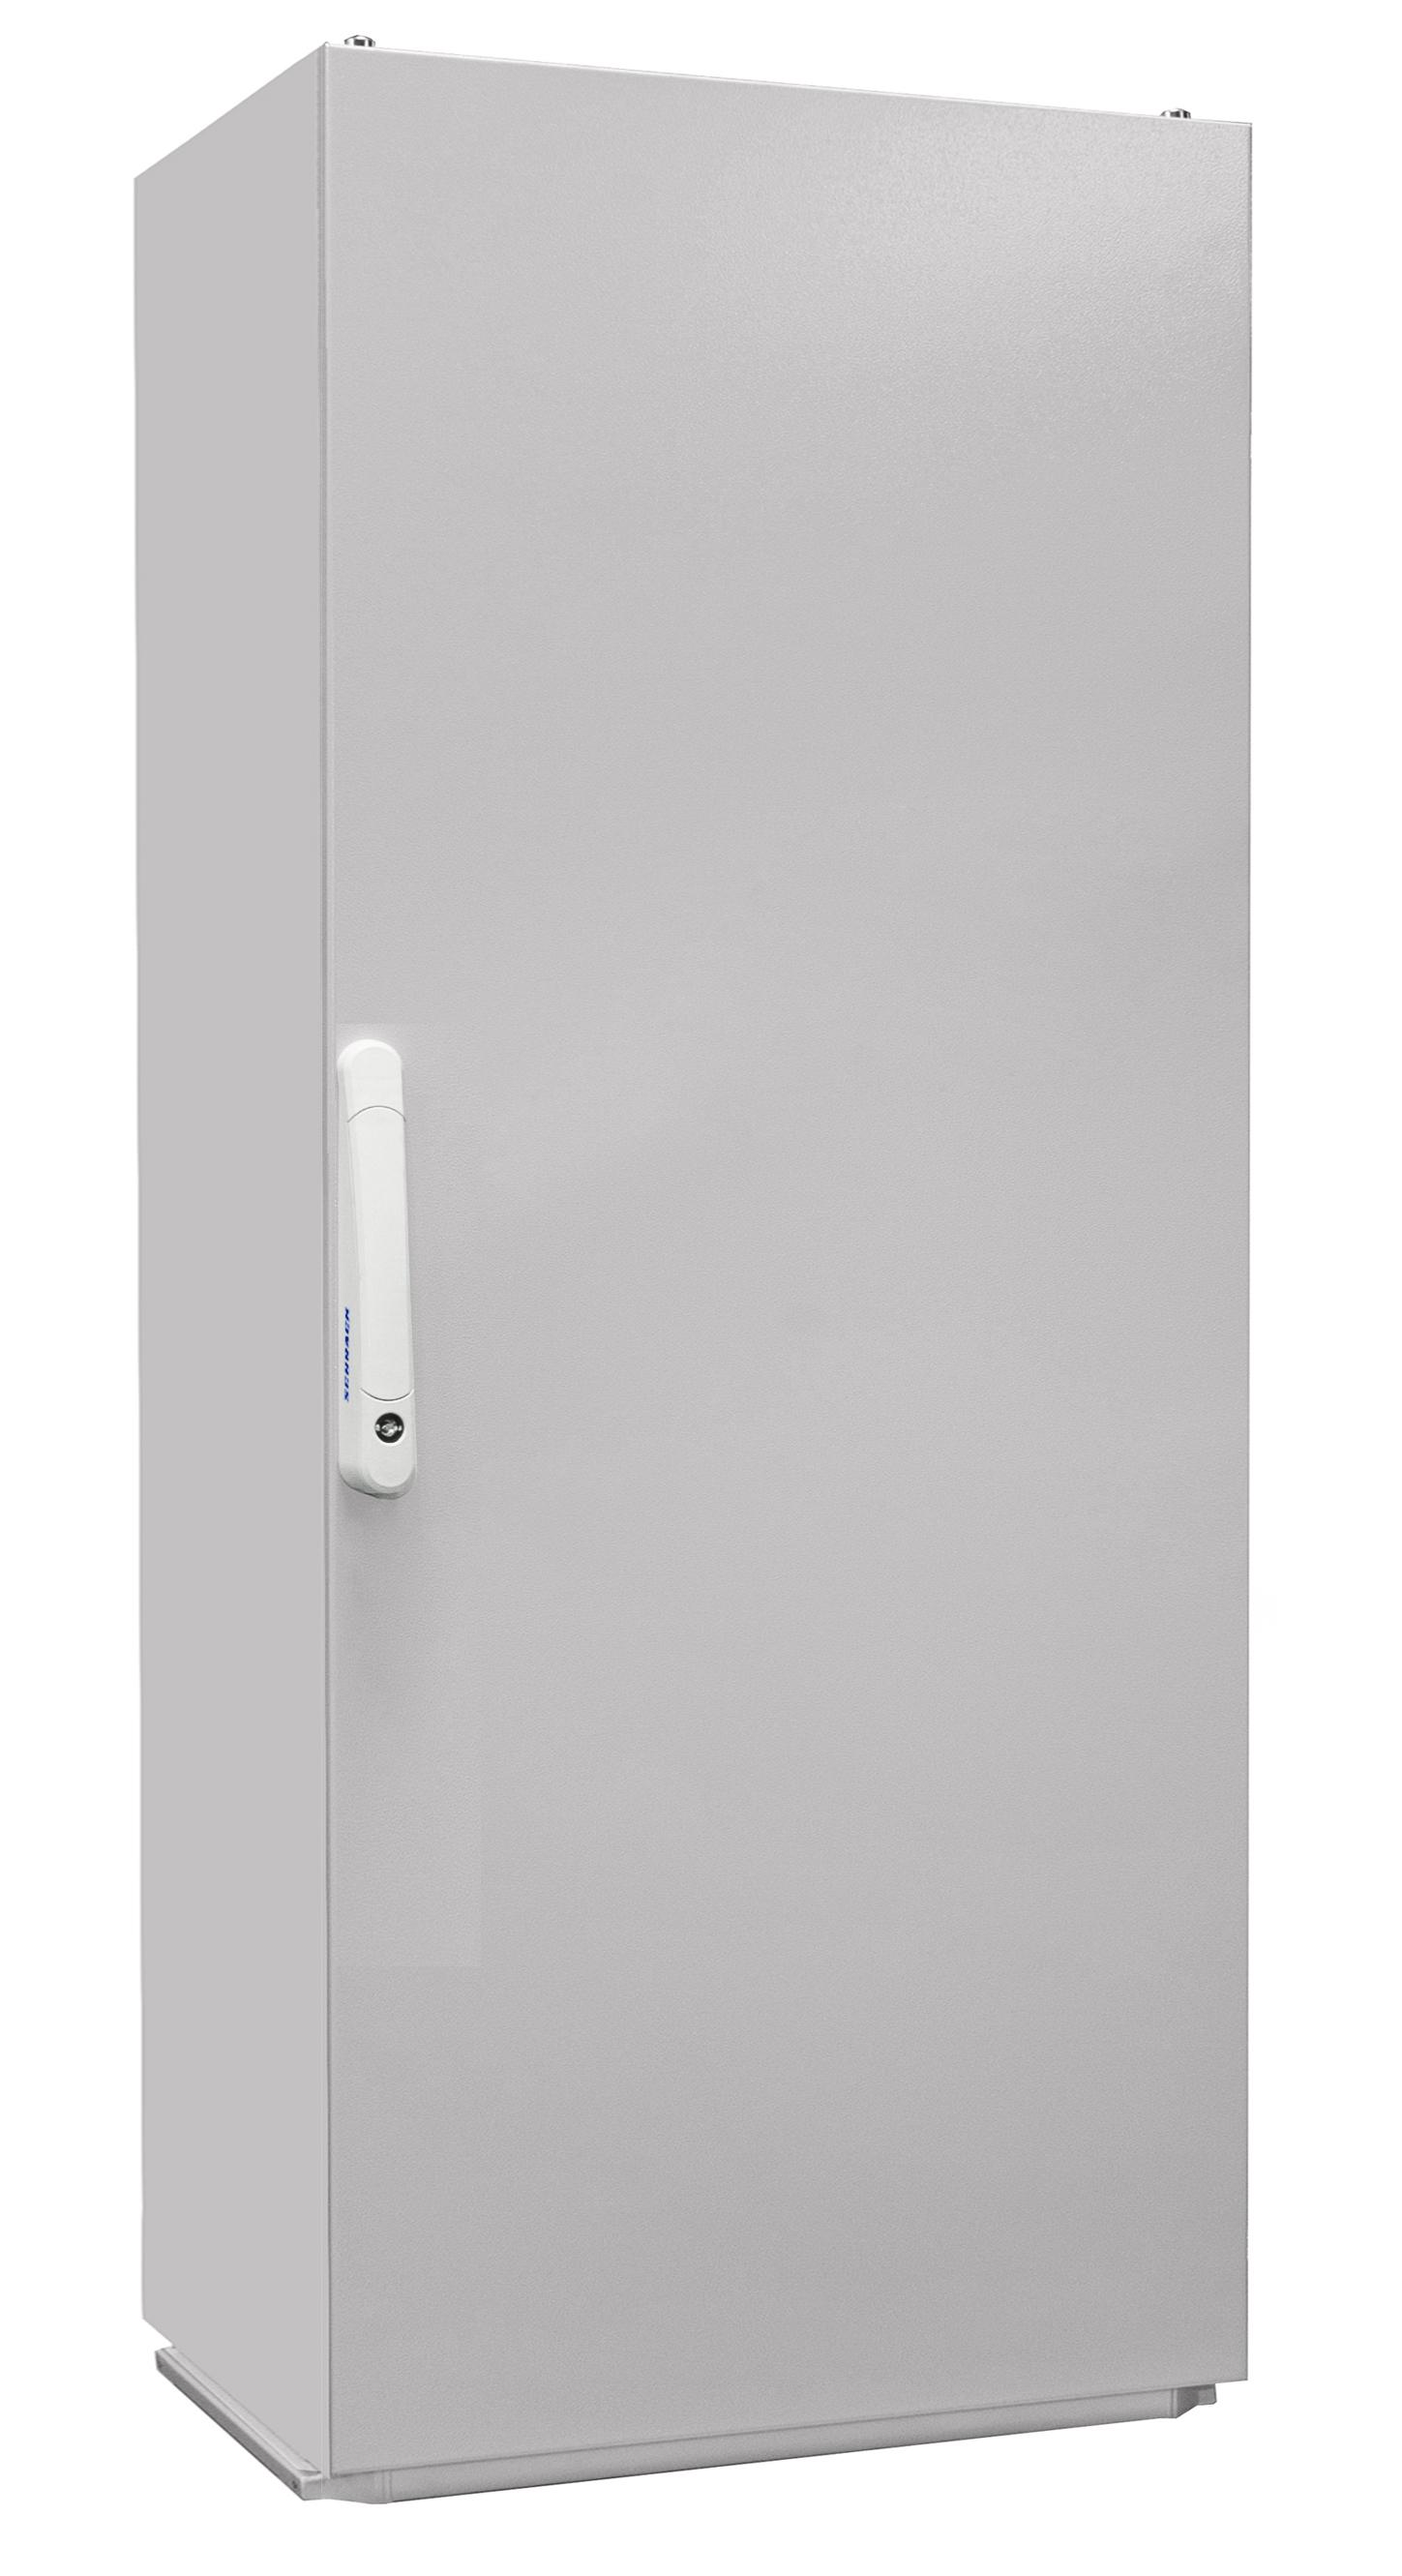 1 Stk Kompaktschrank 1-Tür IP55 H=1400 B=600 T=400mm Stahlblech KC146040--